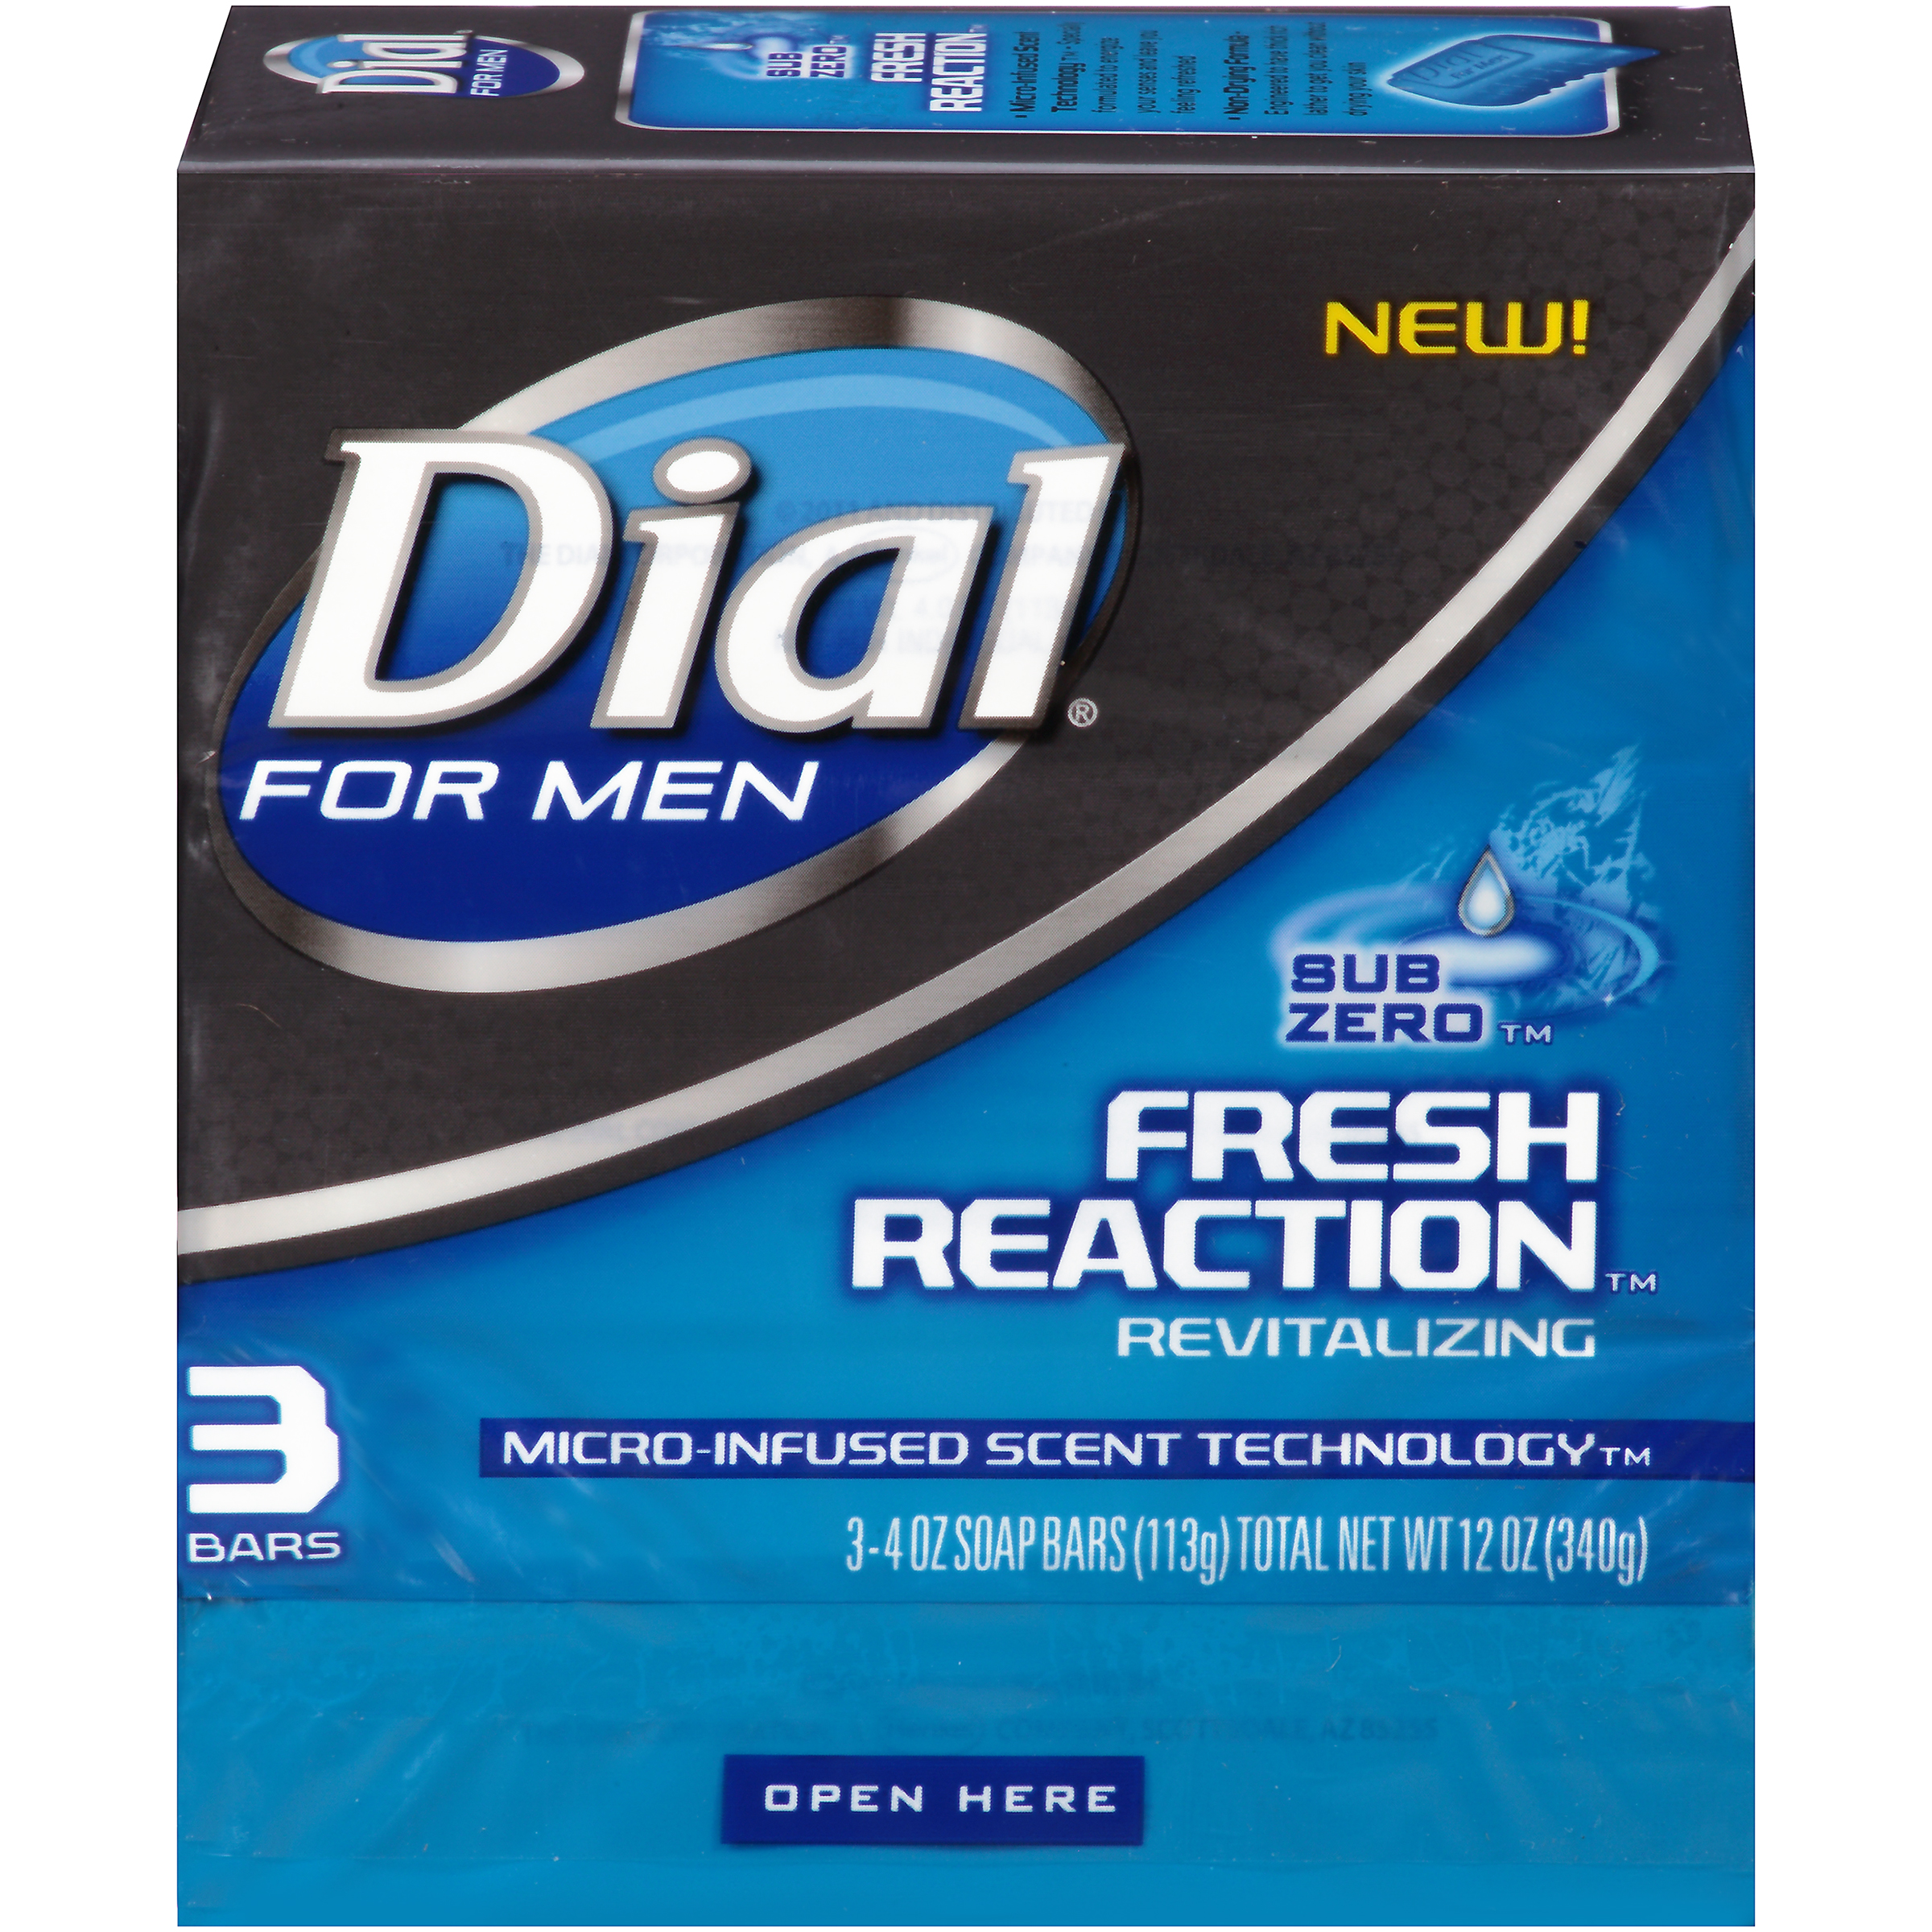 Dial for Men Glycerin Bar Soap, Fresh Reaction Sub Zero, 4 Ounce Bars, 3 Count